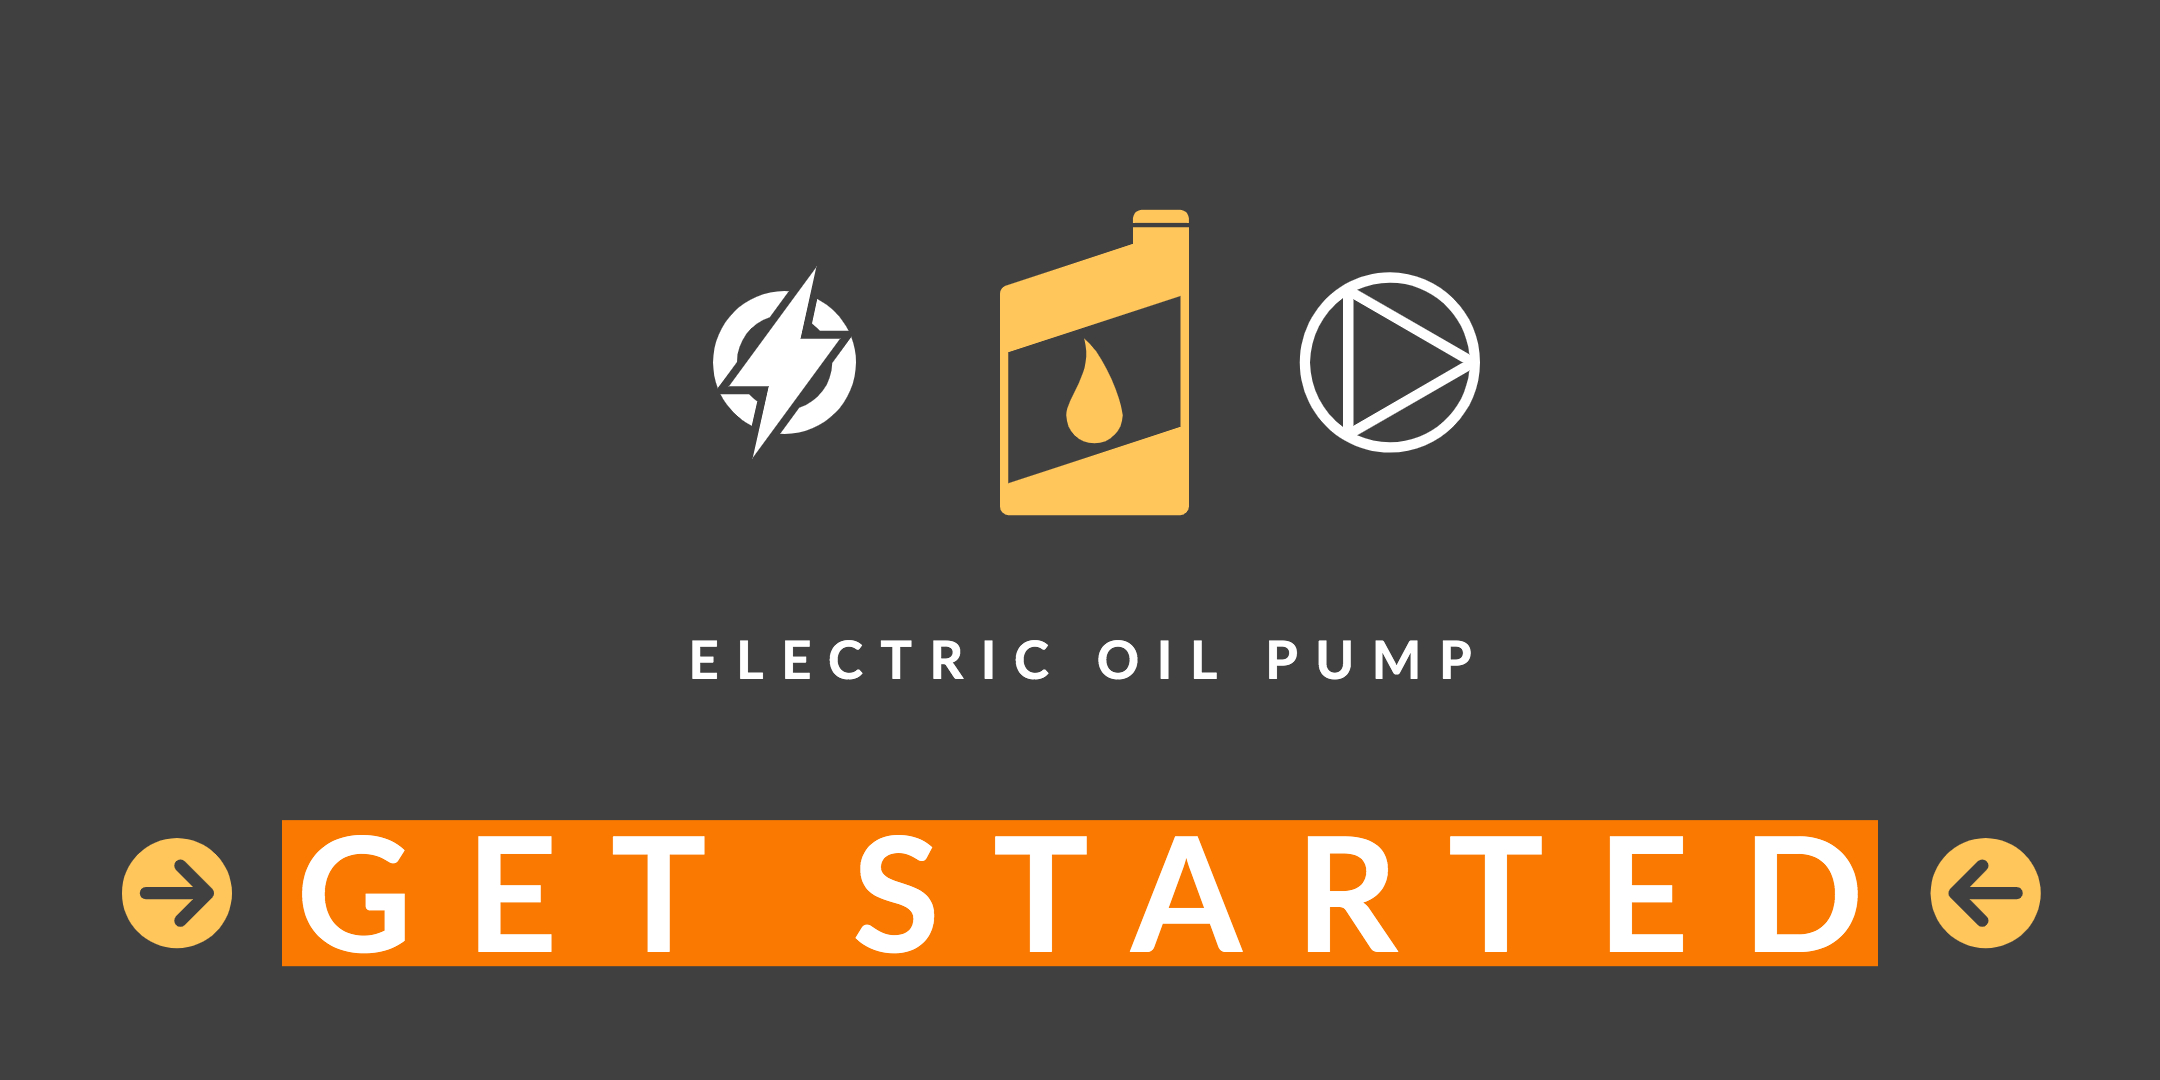 ELECTRIC OIL PUMPS.jpg